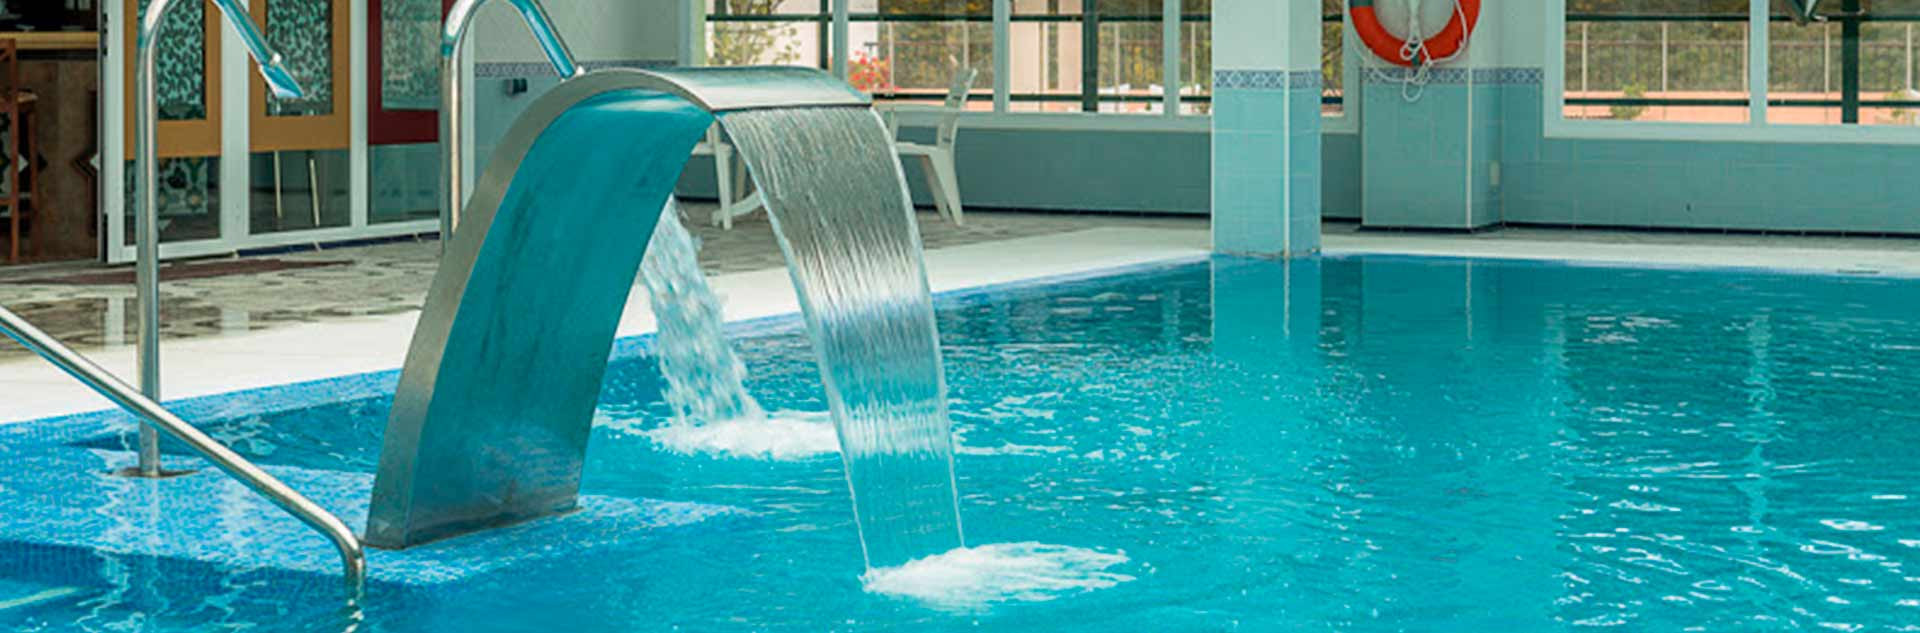 Piscina con cascada de agua del hotel de Marbella